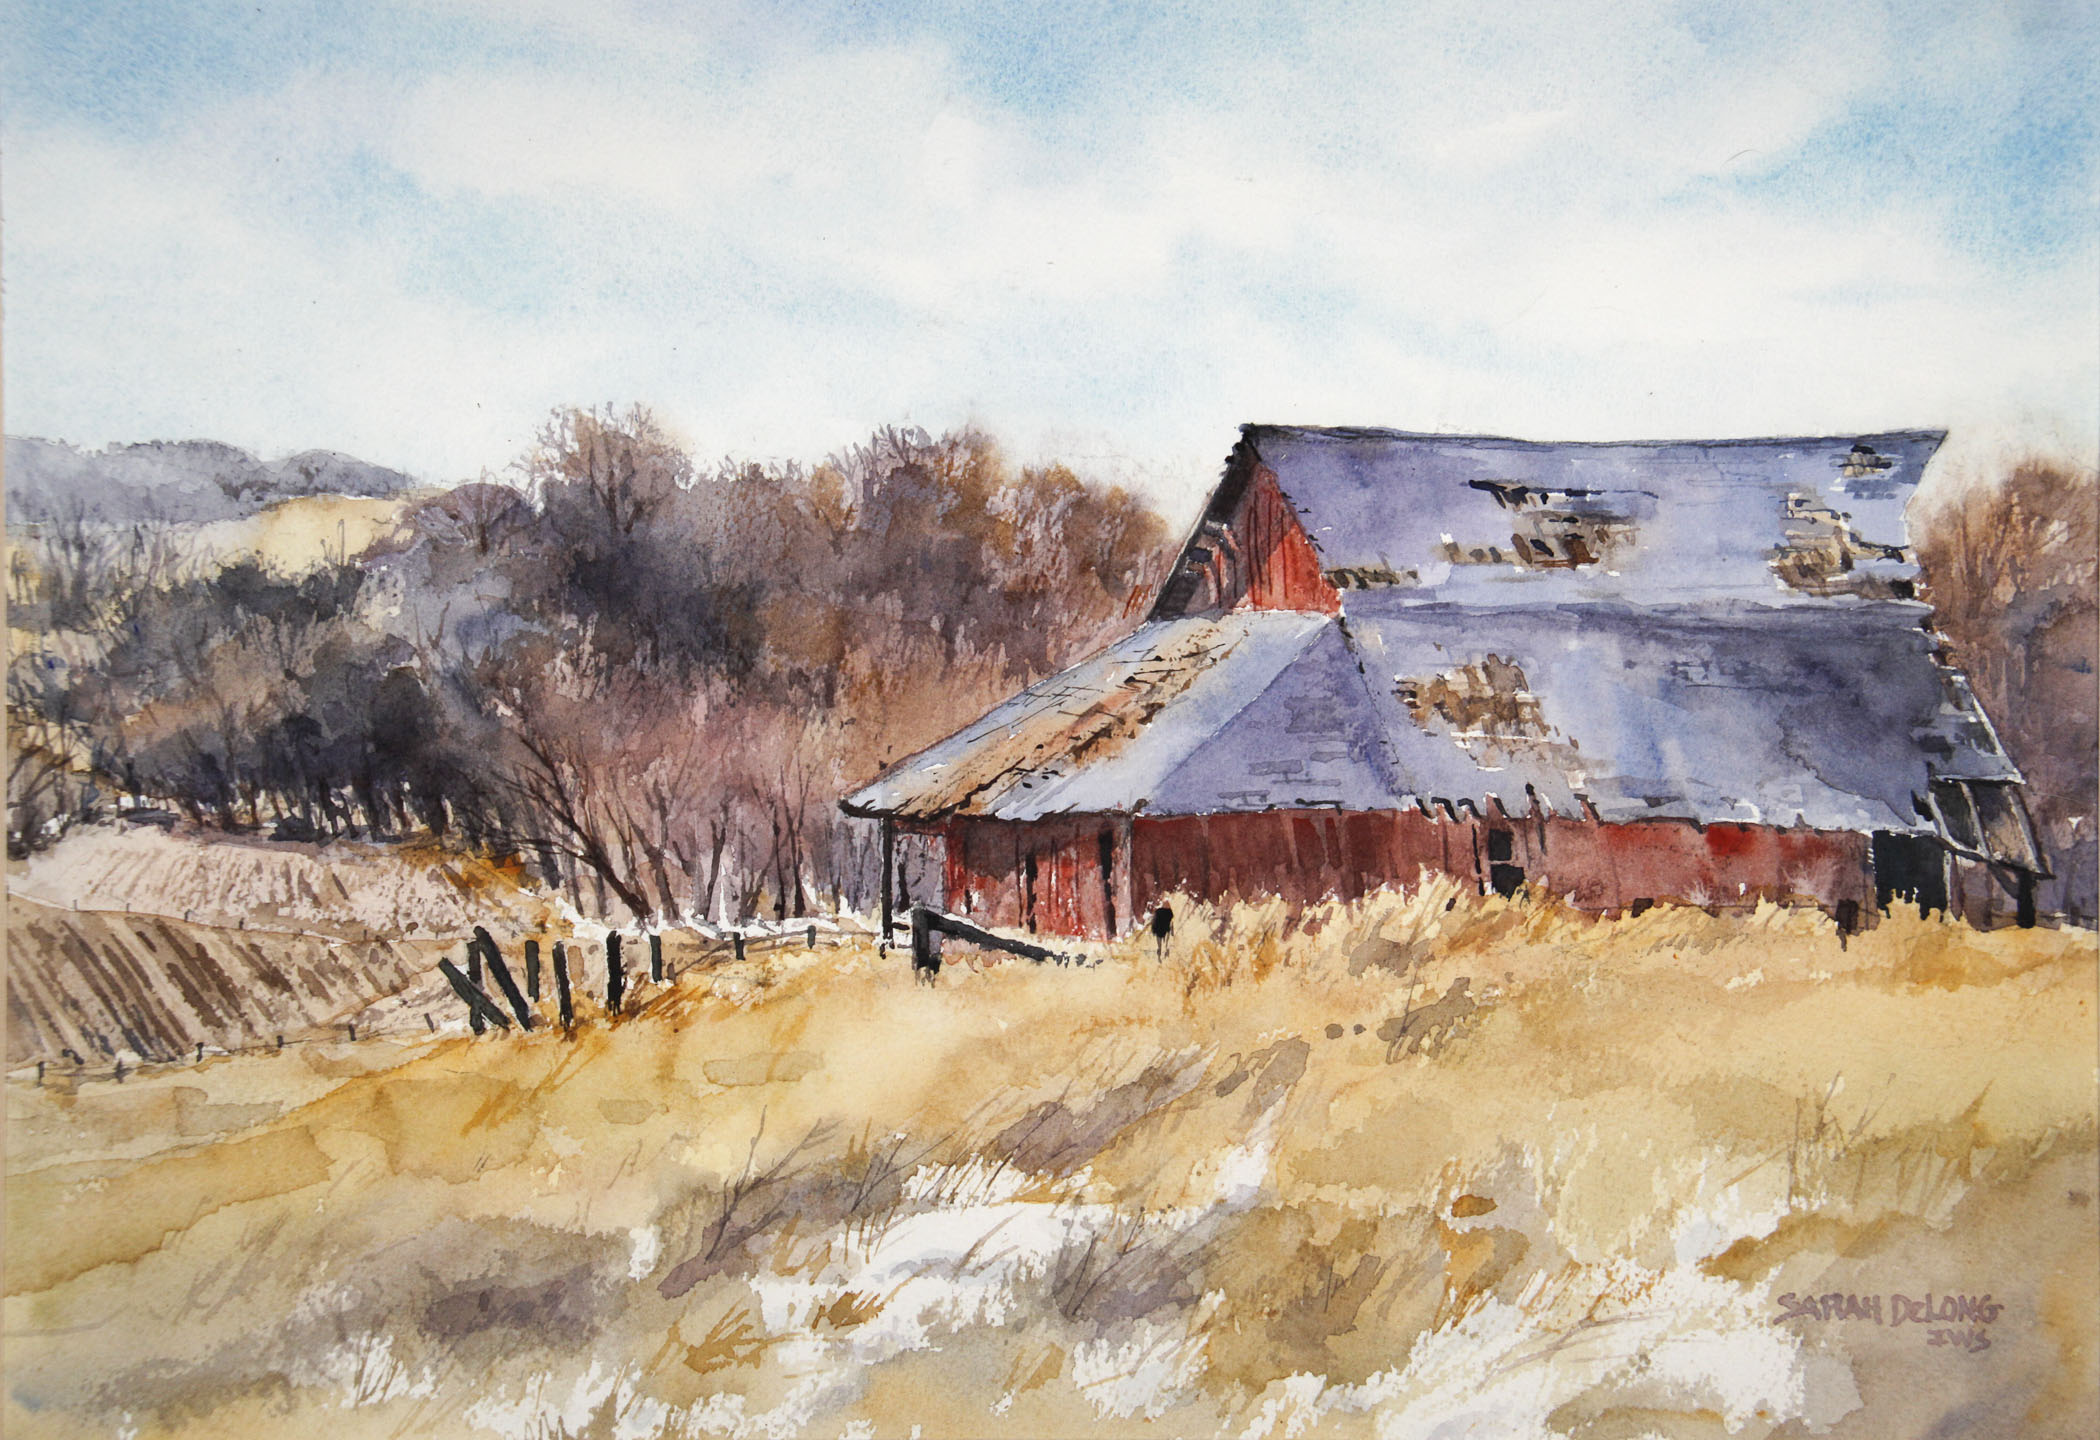 Blue Roof Barn's Last Days